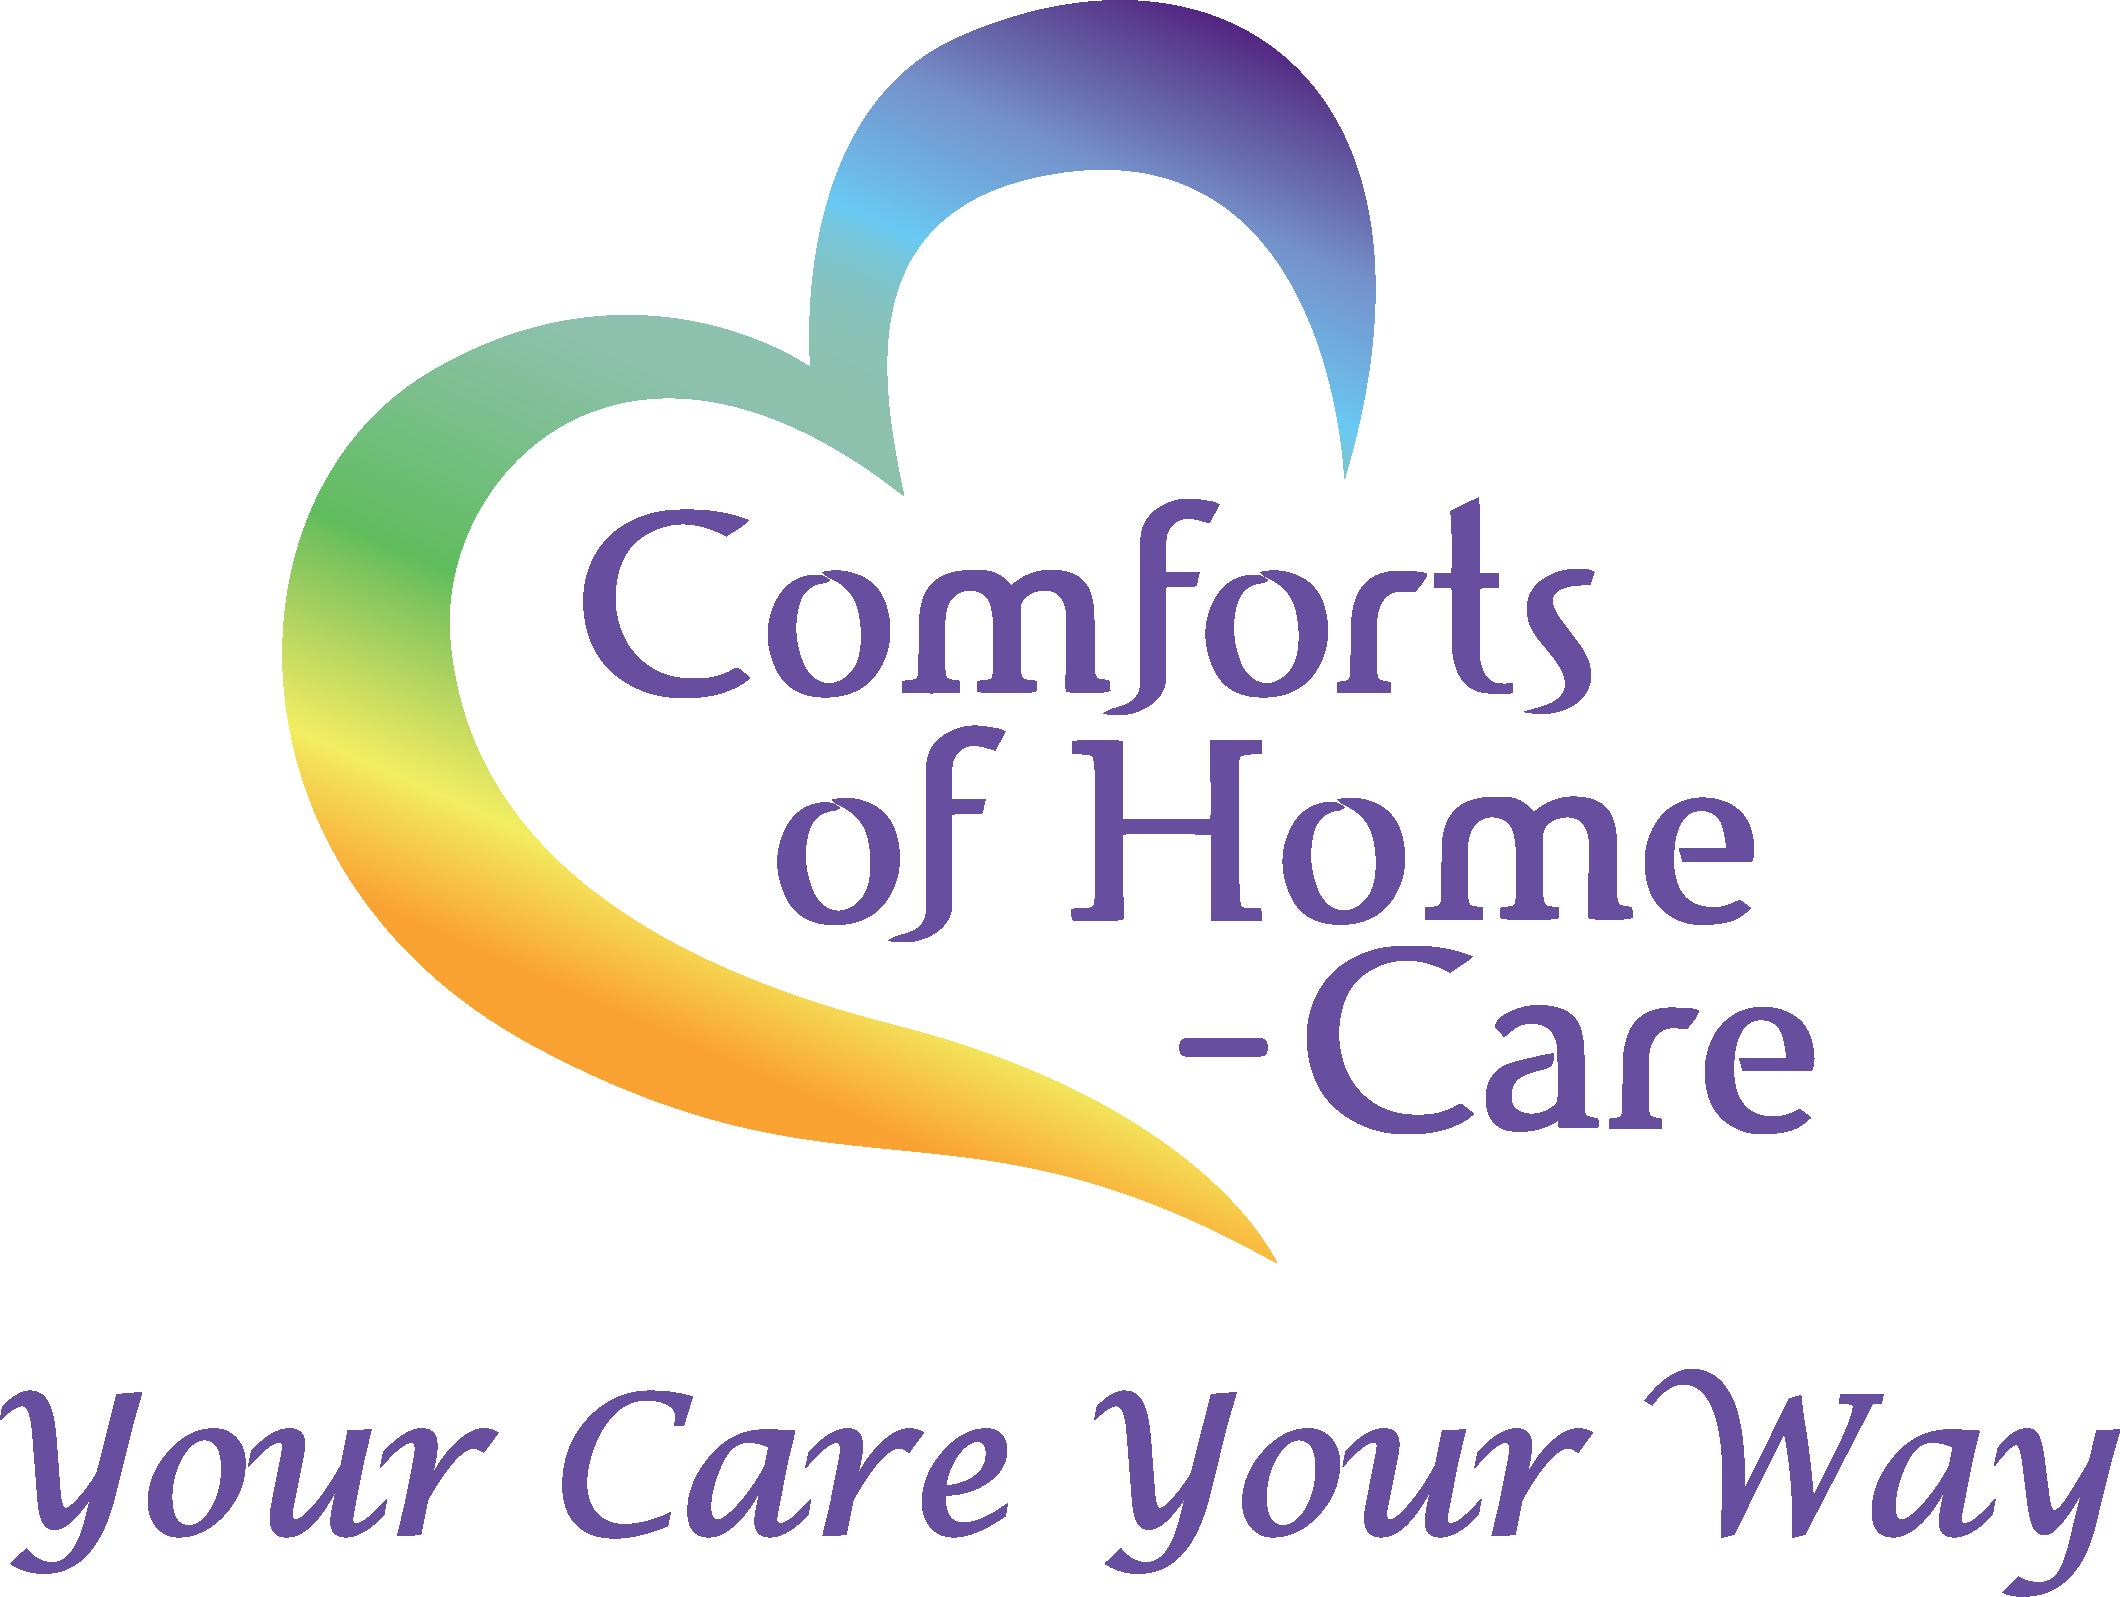 ComfortsofHomeCare-tagline.png